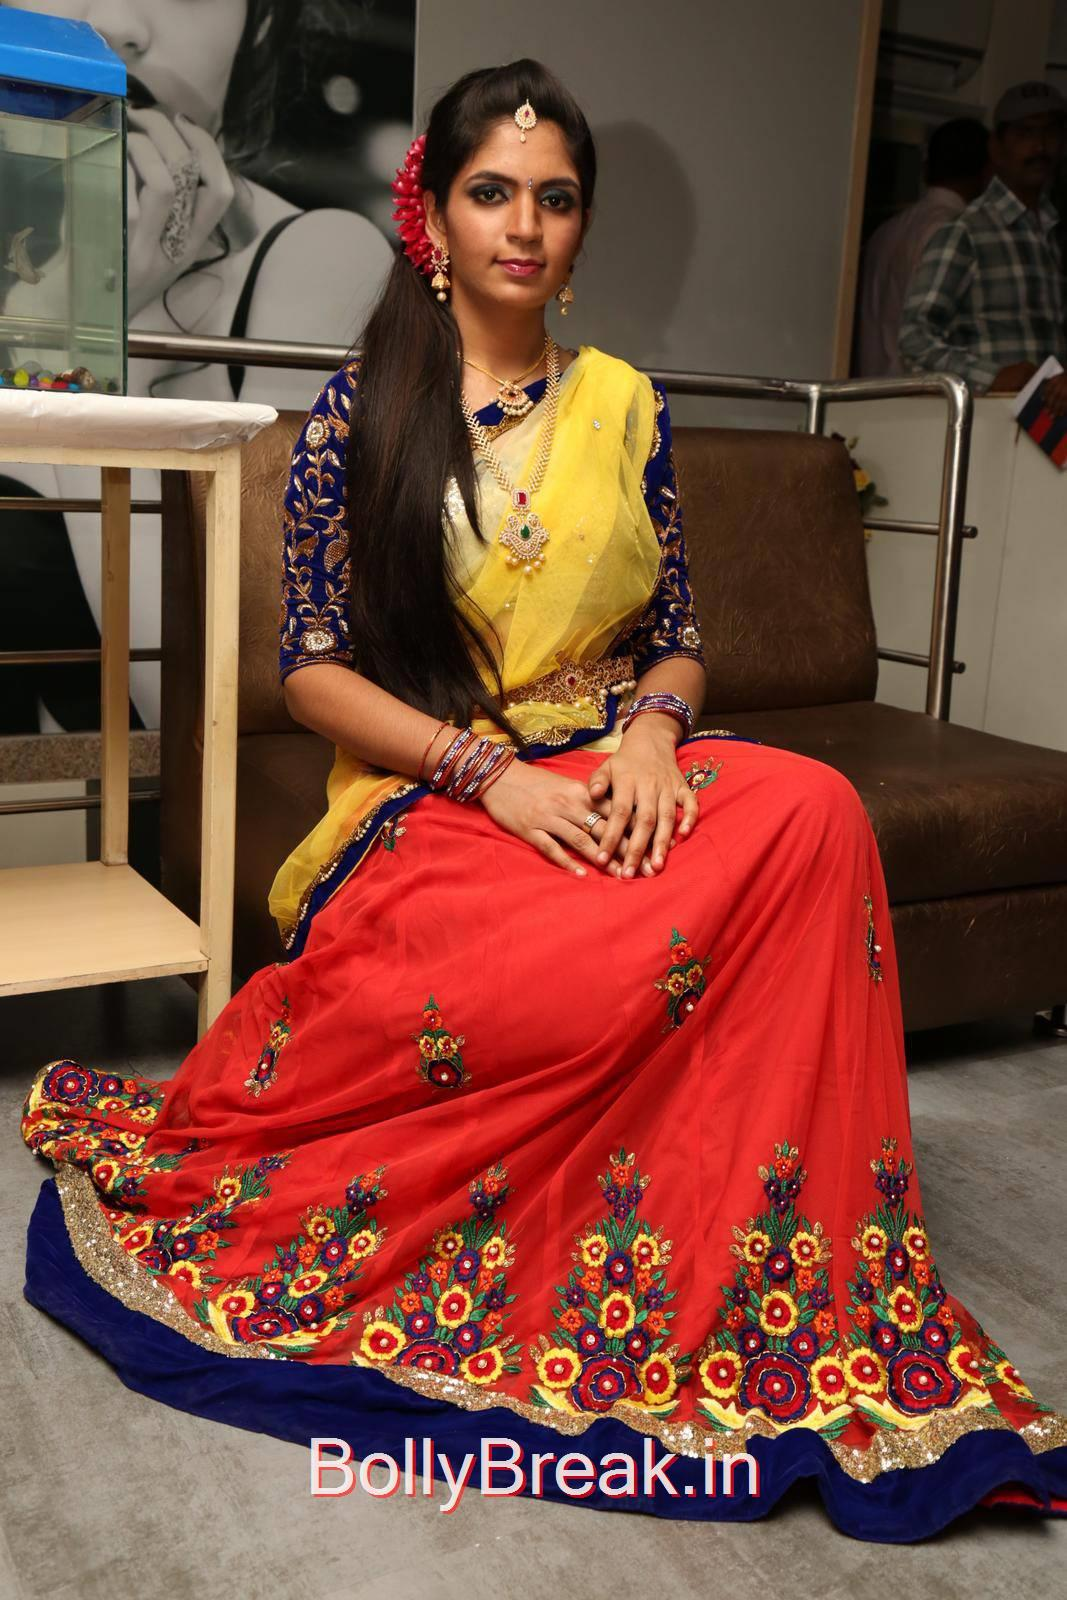 Anusha Stills, Anusha Hot Pics from Bridal Dream Make up At Lakme Salon